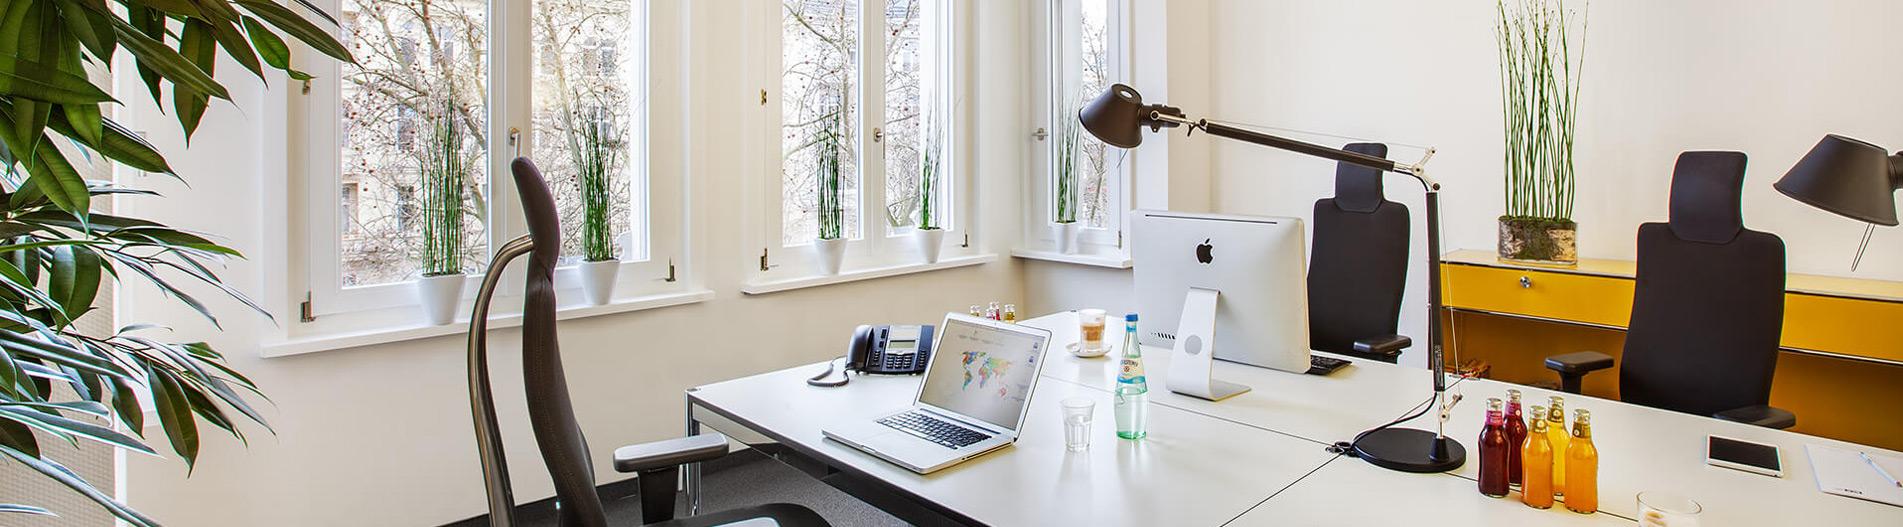 Rent office space at Business Center Berlin Kurfürstendamm